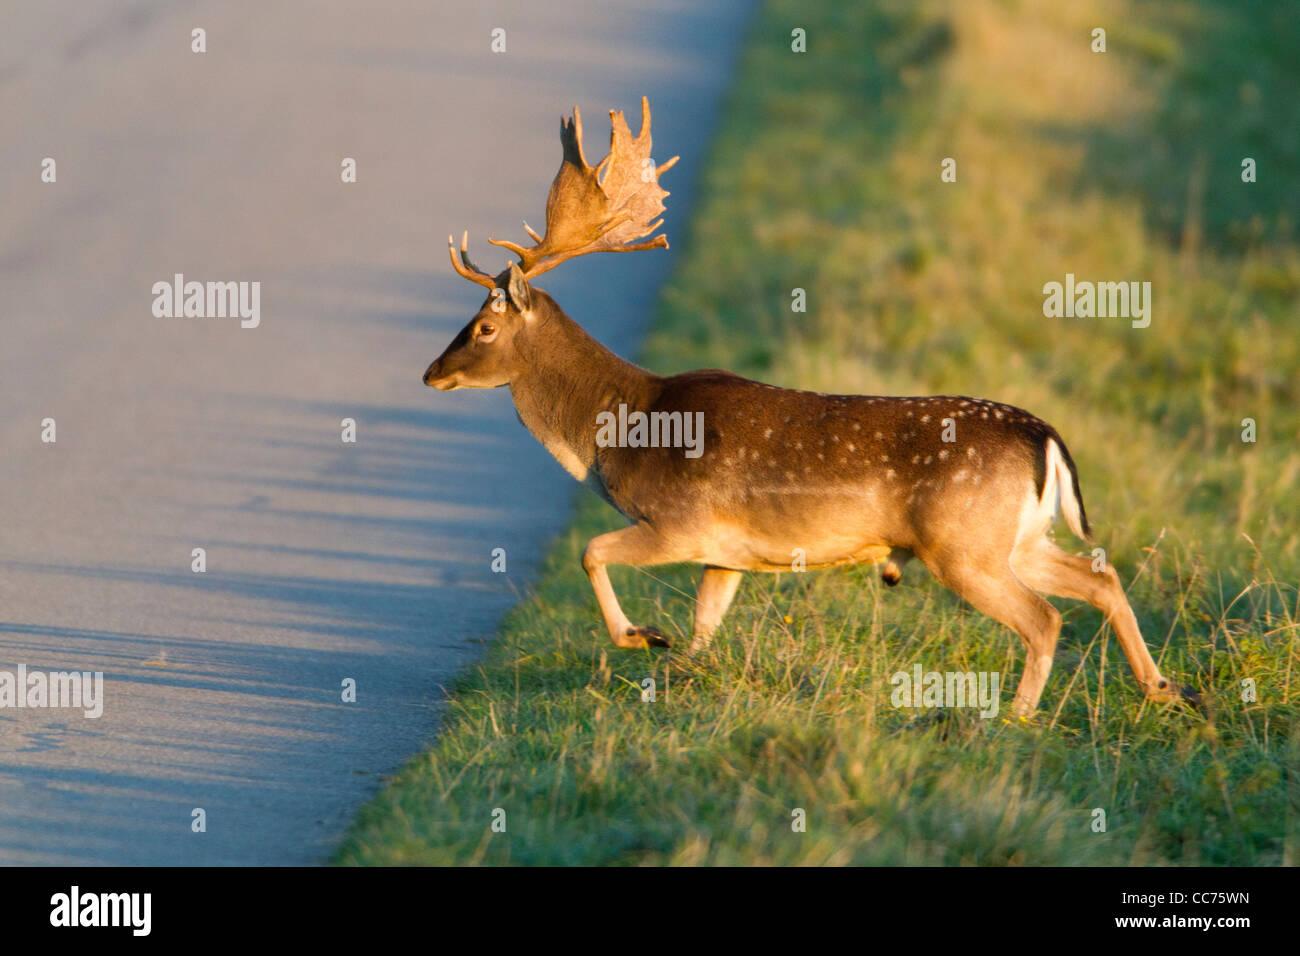 El gamo (Dama dama), Buck Crossing Road, Royal Deer Park, Klampenborg, Copenhague, Sjaelland, Dinamarca Foto de stock